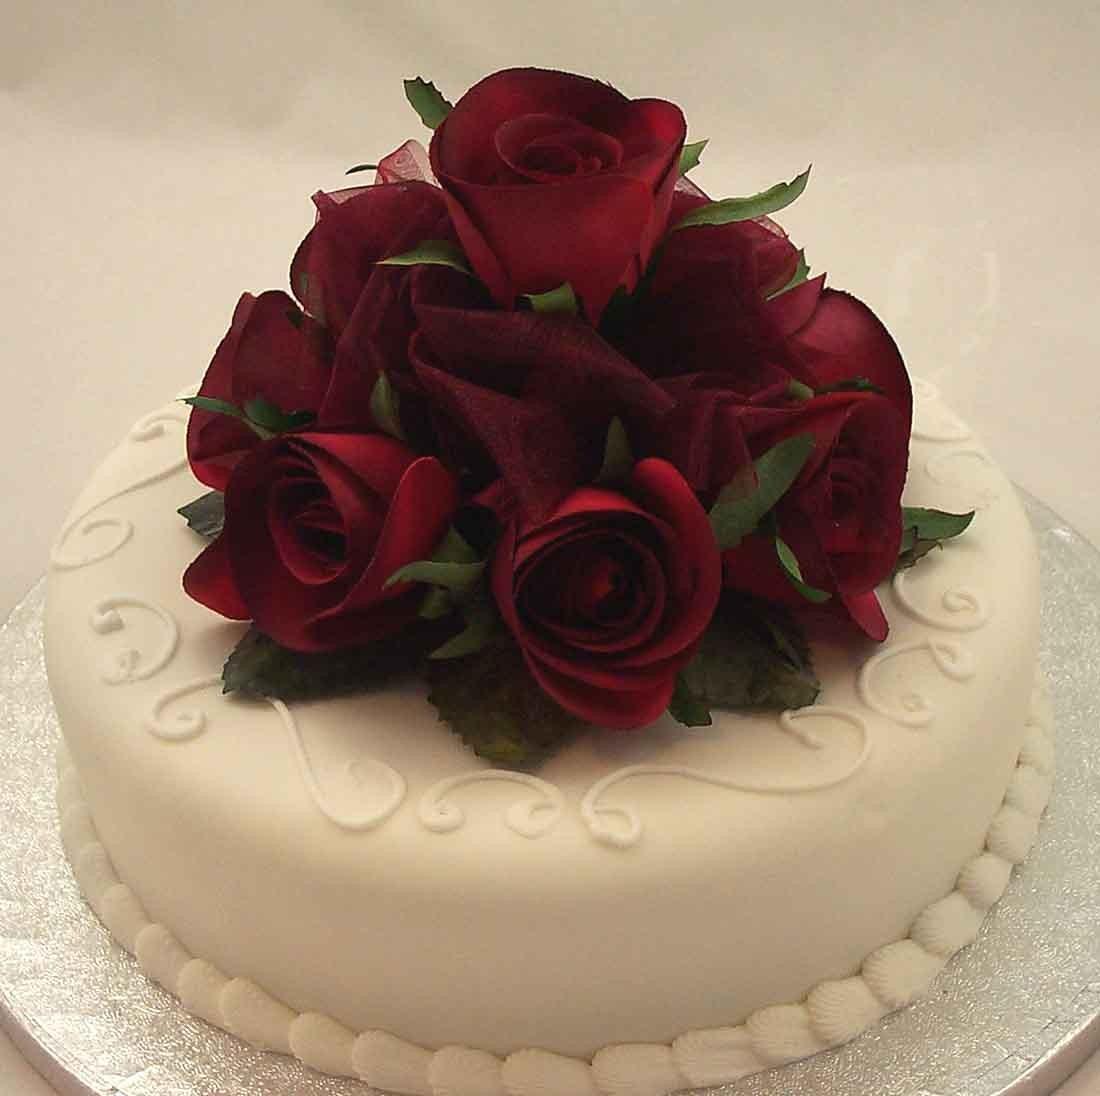 Using Silk Flowers On Wedding Cake